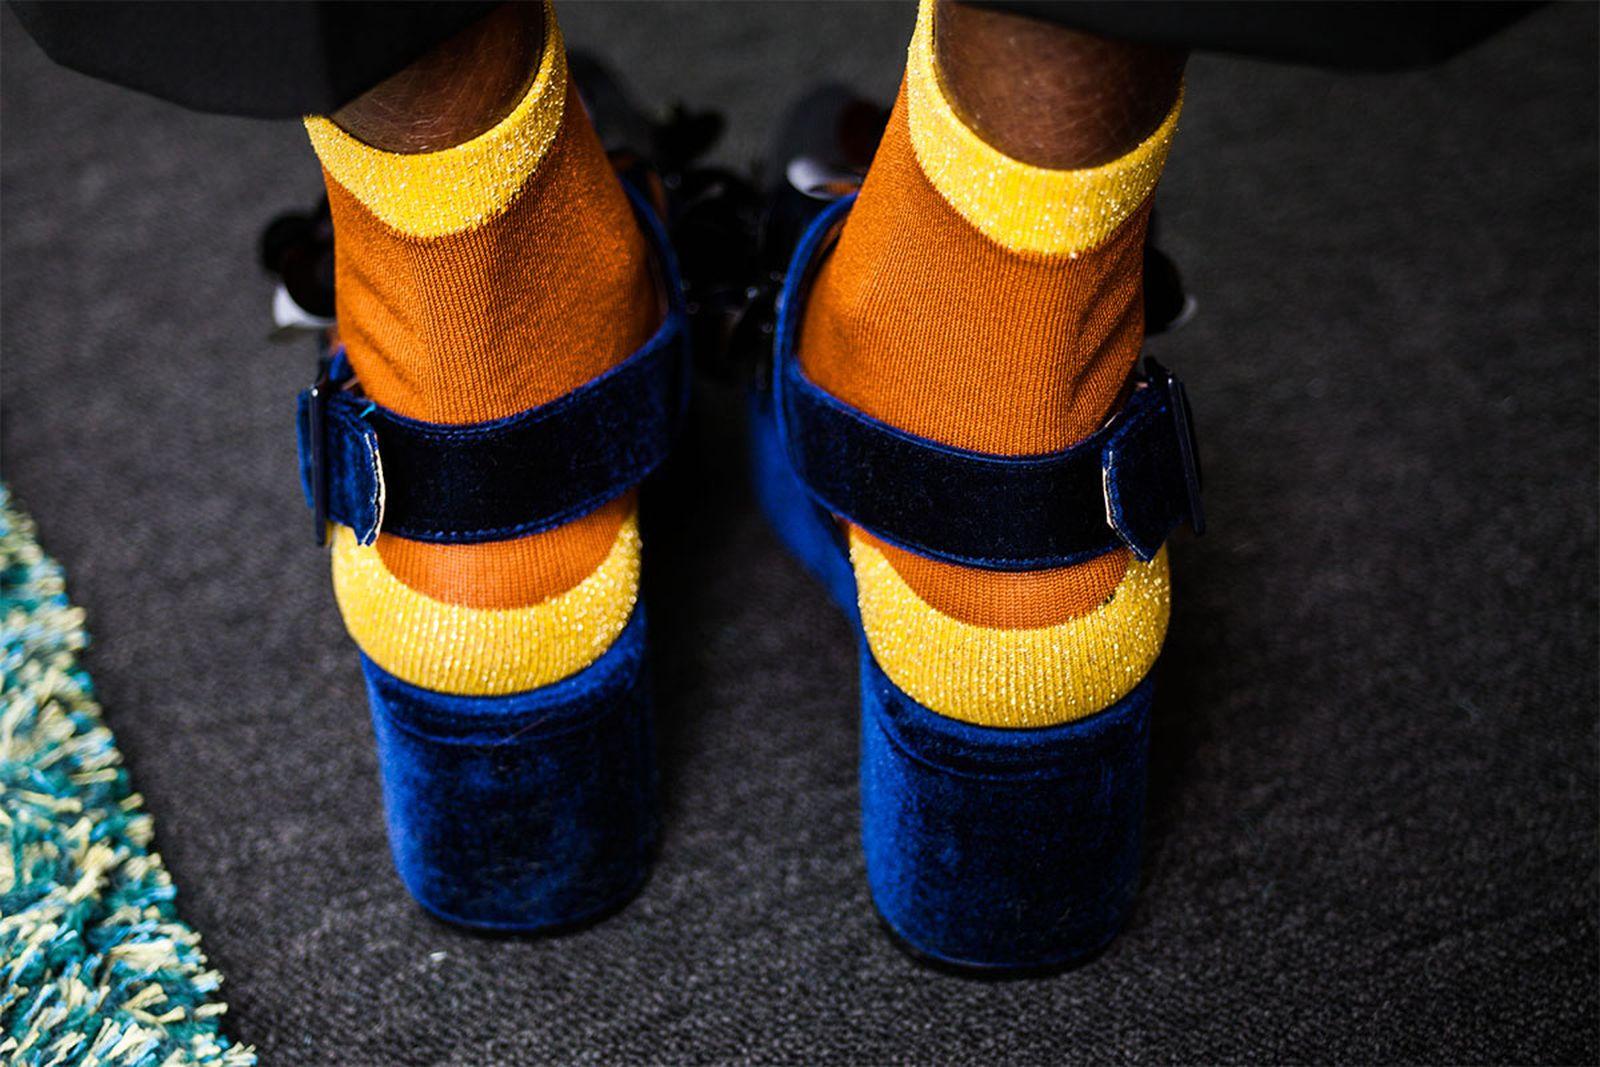 Meet Happy Socks: The Brand That Changed Socks Forever